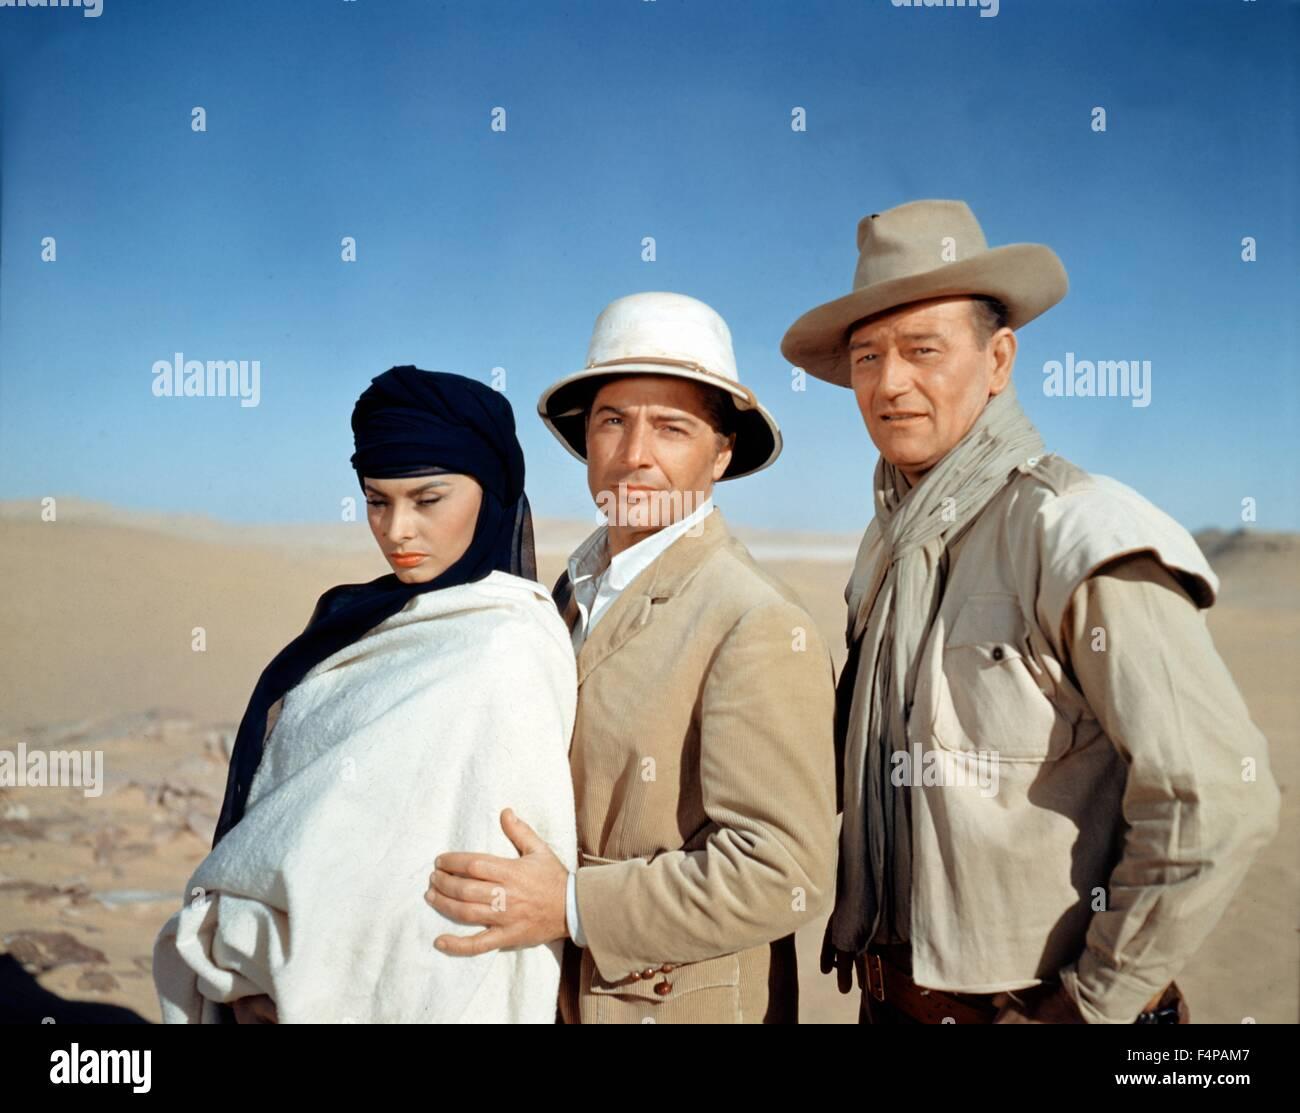 Sophia Loren, Rossano Brazzi, John Wayne / Legend of the Lost 1957 directed by Henry Hathaway - Stock Image